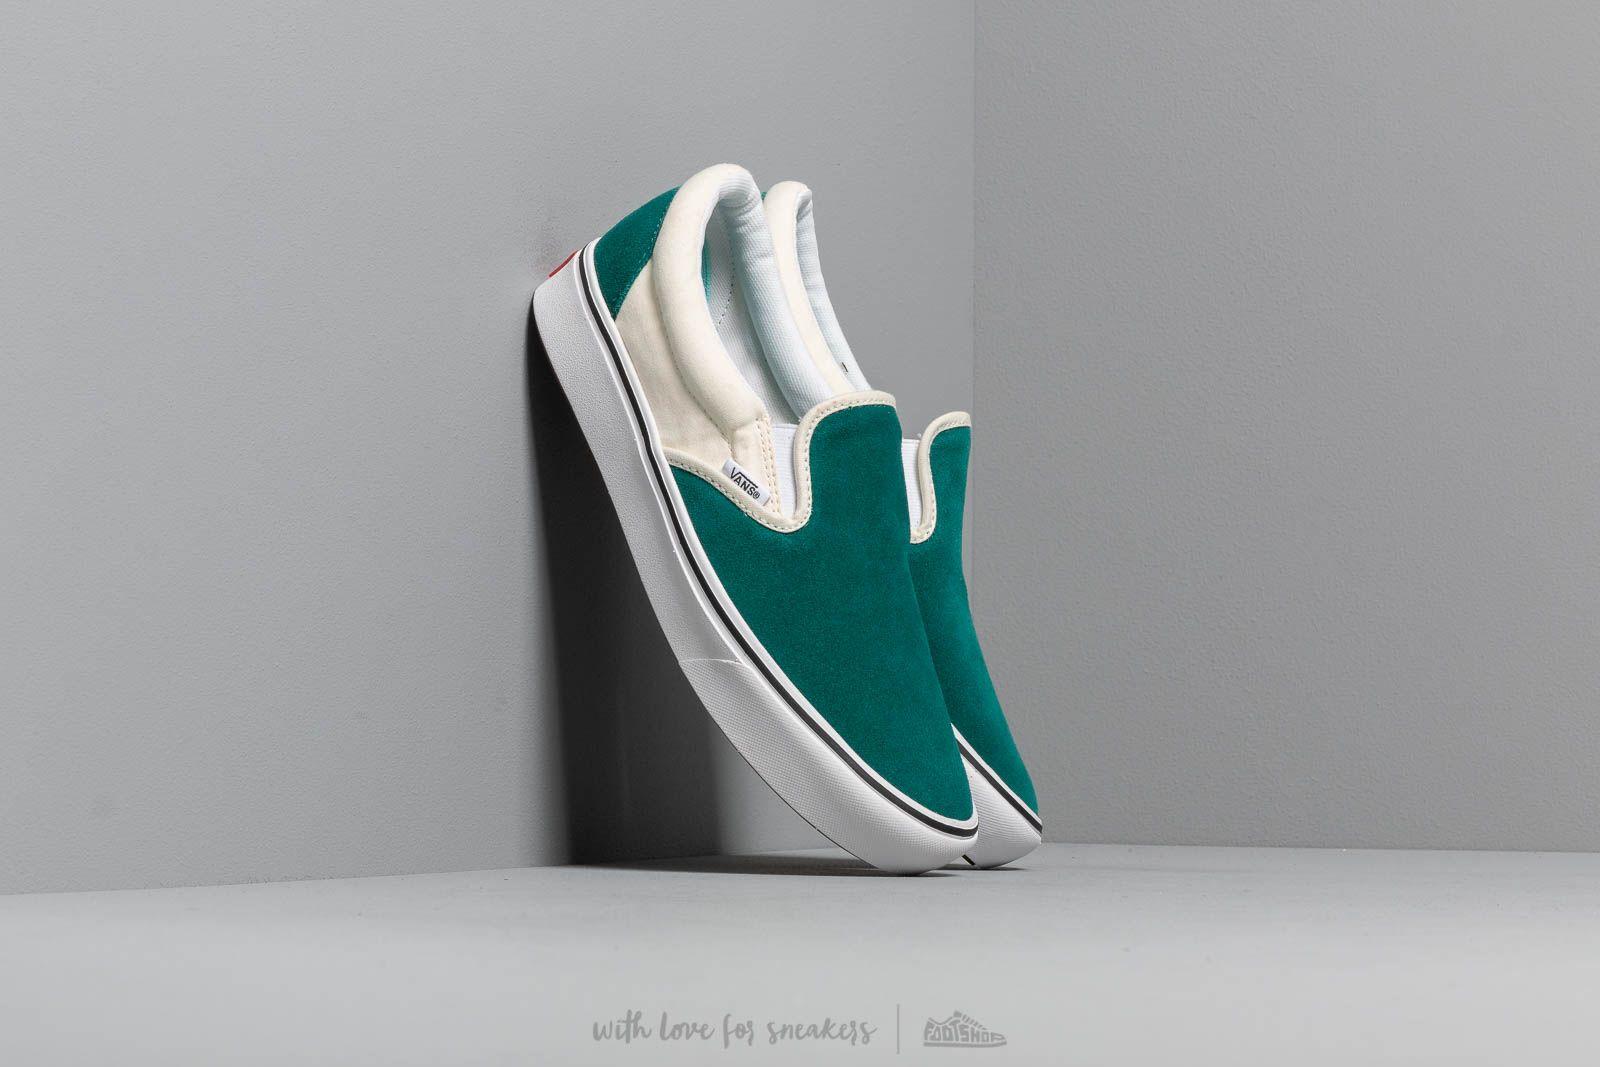 Vans ComfyCush Slip-On (Two Tone) Quetzal/ Classic za skvělou cenu 1 690 Kč koupíte na Footshop.cz